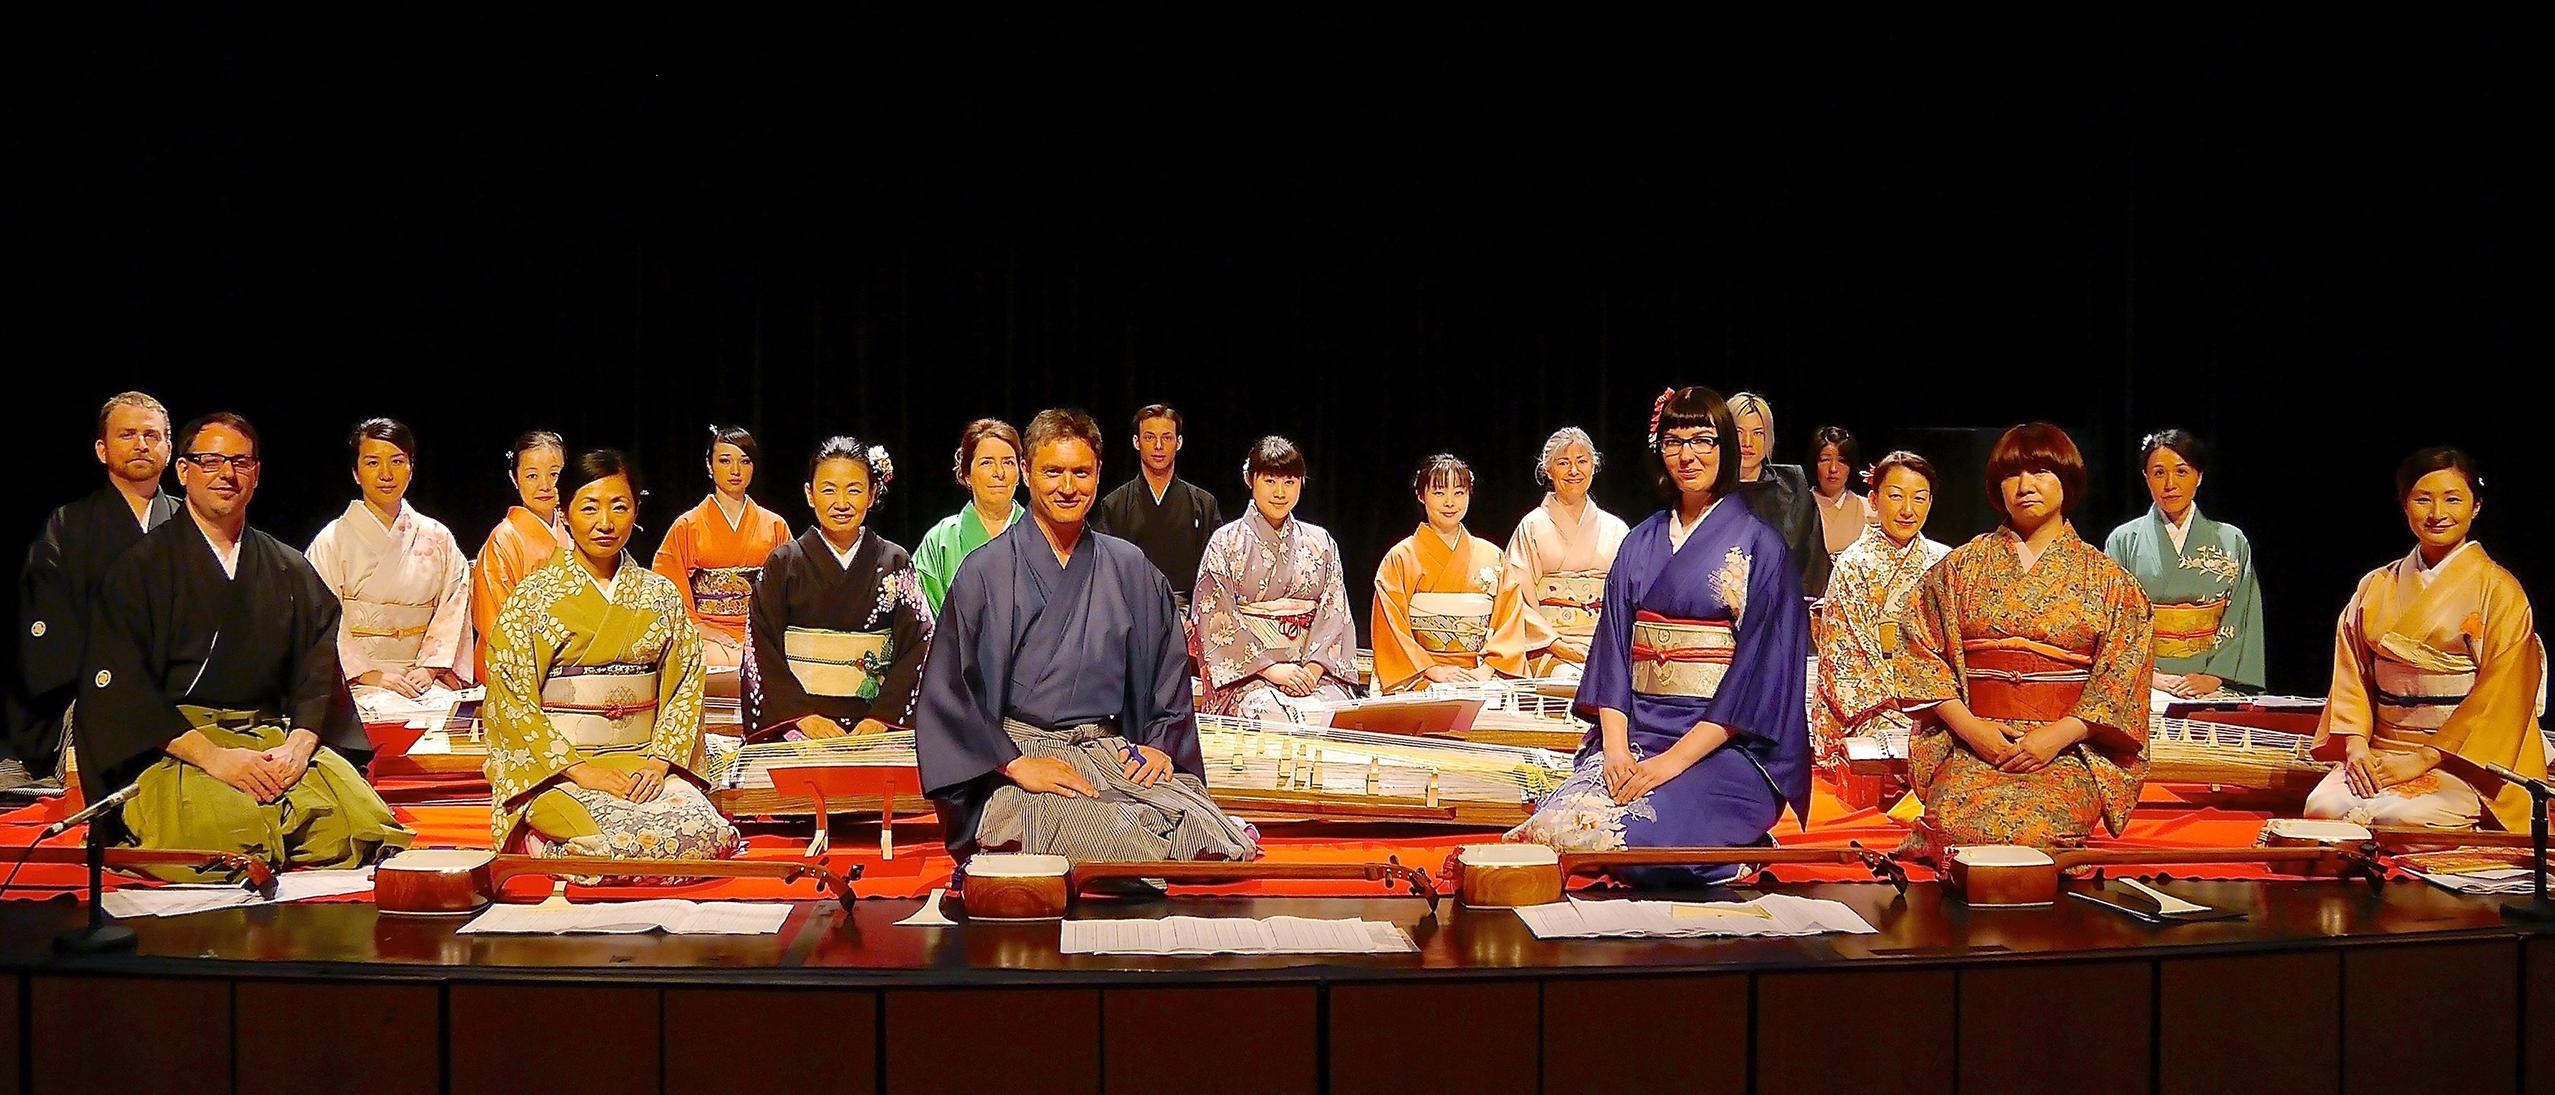 Members of the Miyabi Koto Shamisen Ensemble posing for a photo.